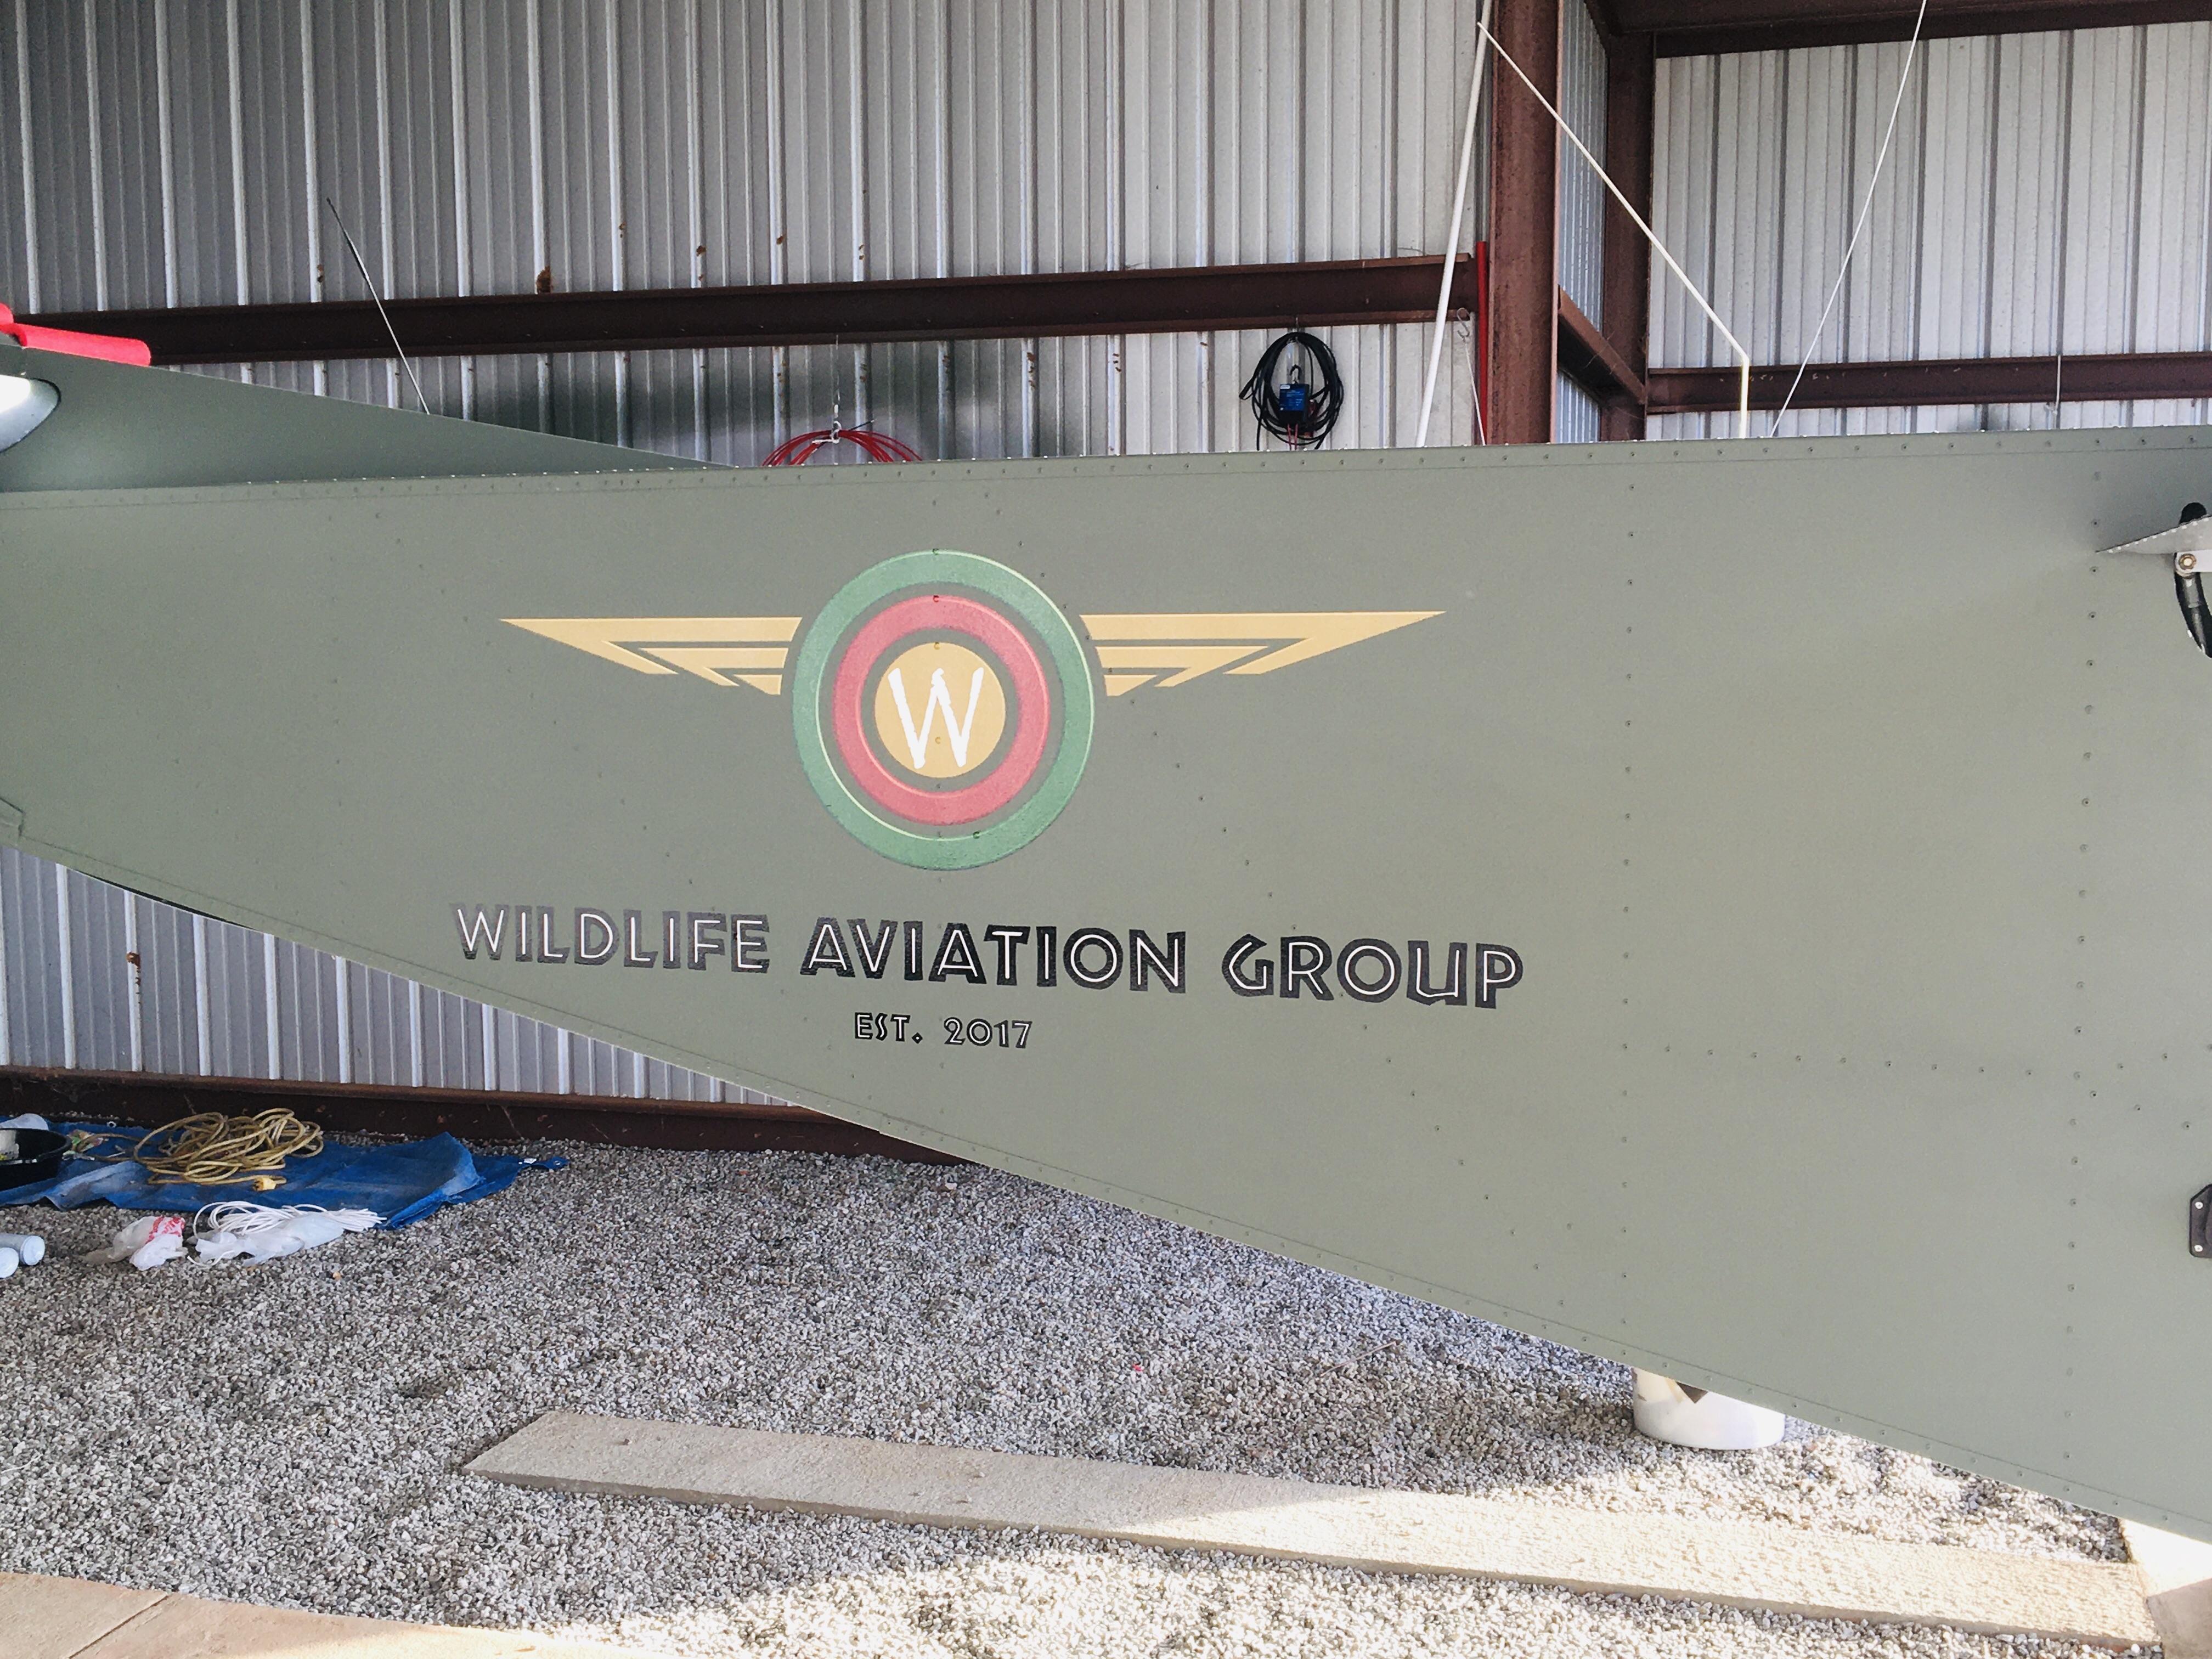 Wildlife Aviation Group